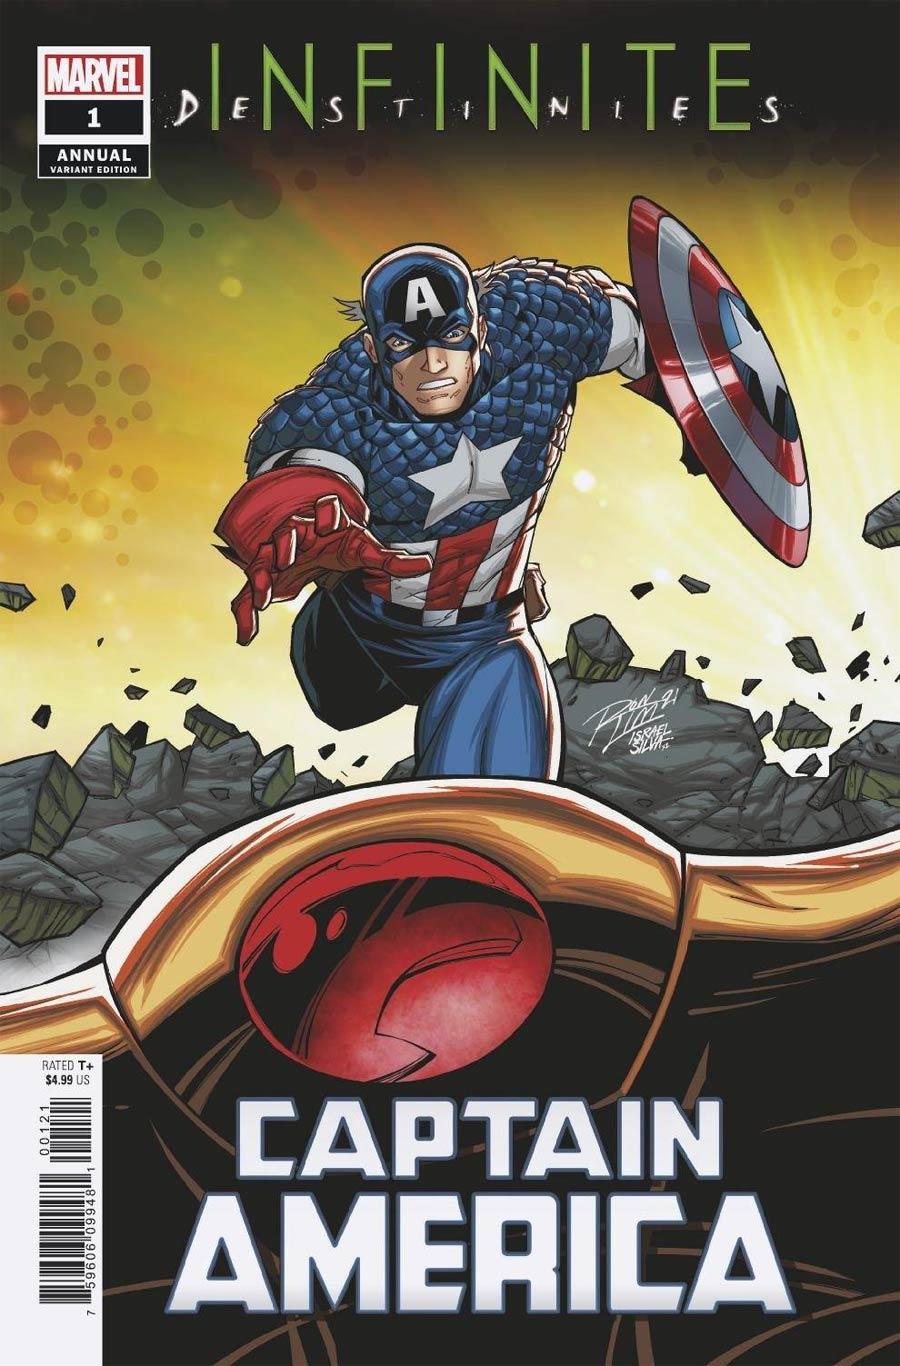 Captain America Vol 9 Annual #1 (2021) Cover B Variant Ron Lim Connecting Cover (Infinite Destinies Tie-In)